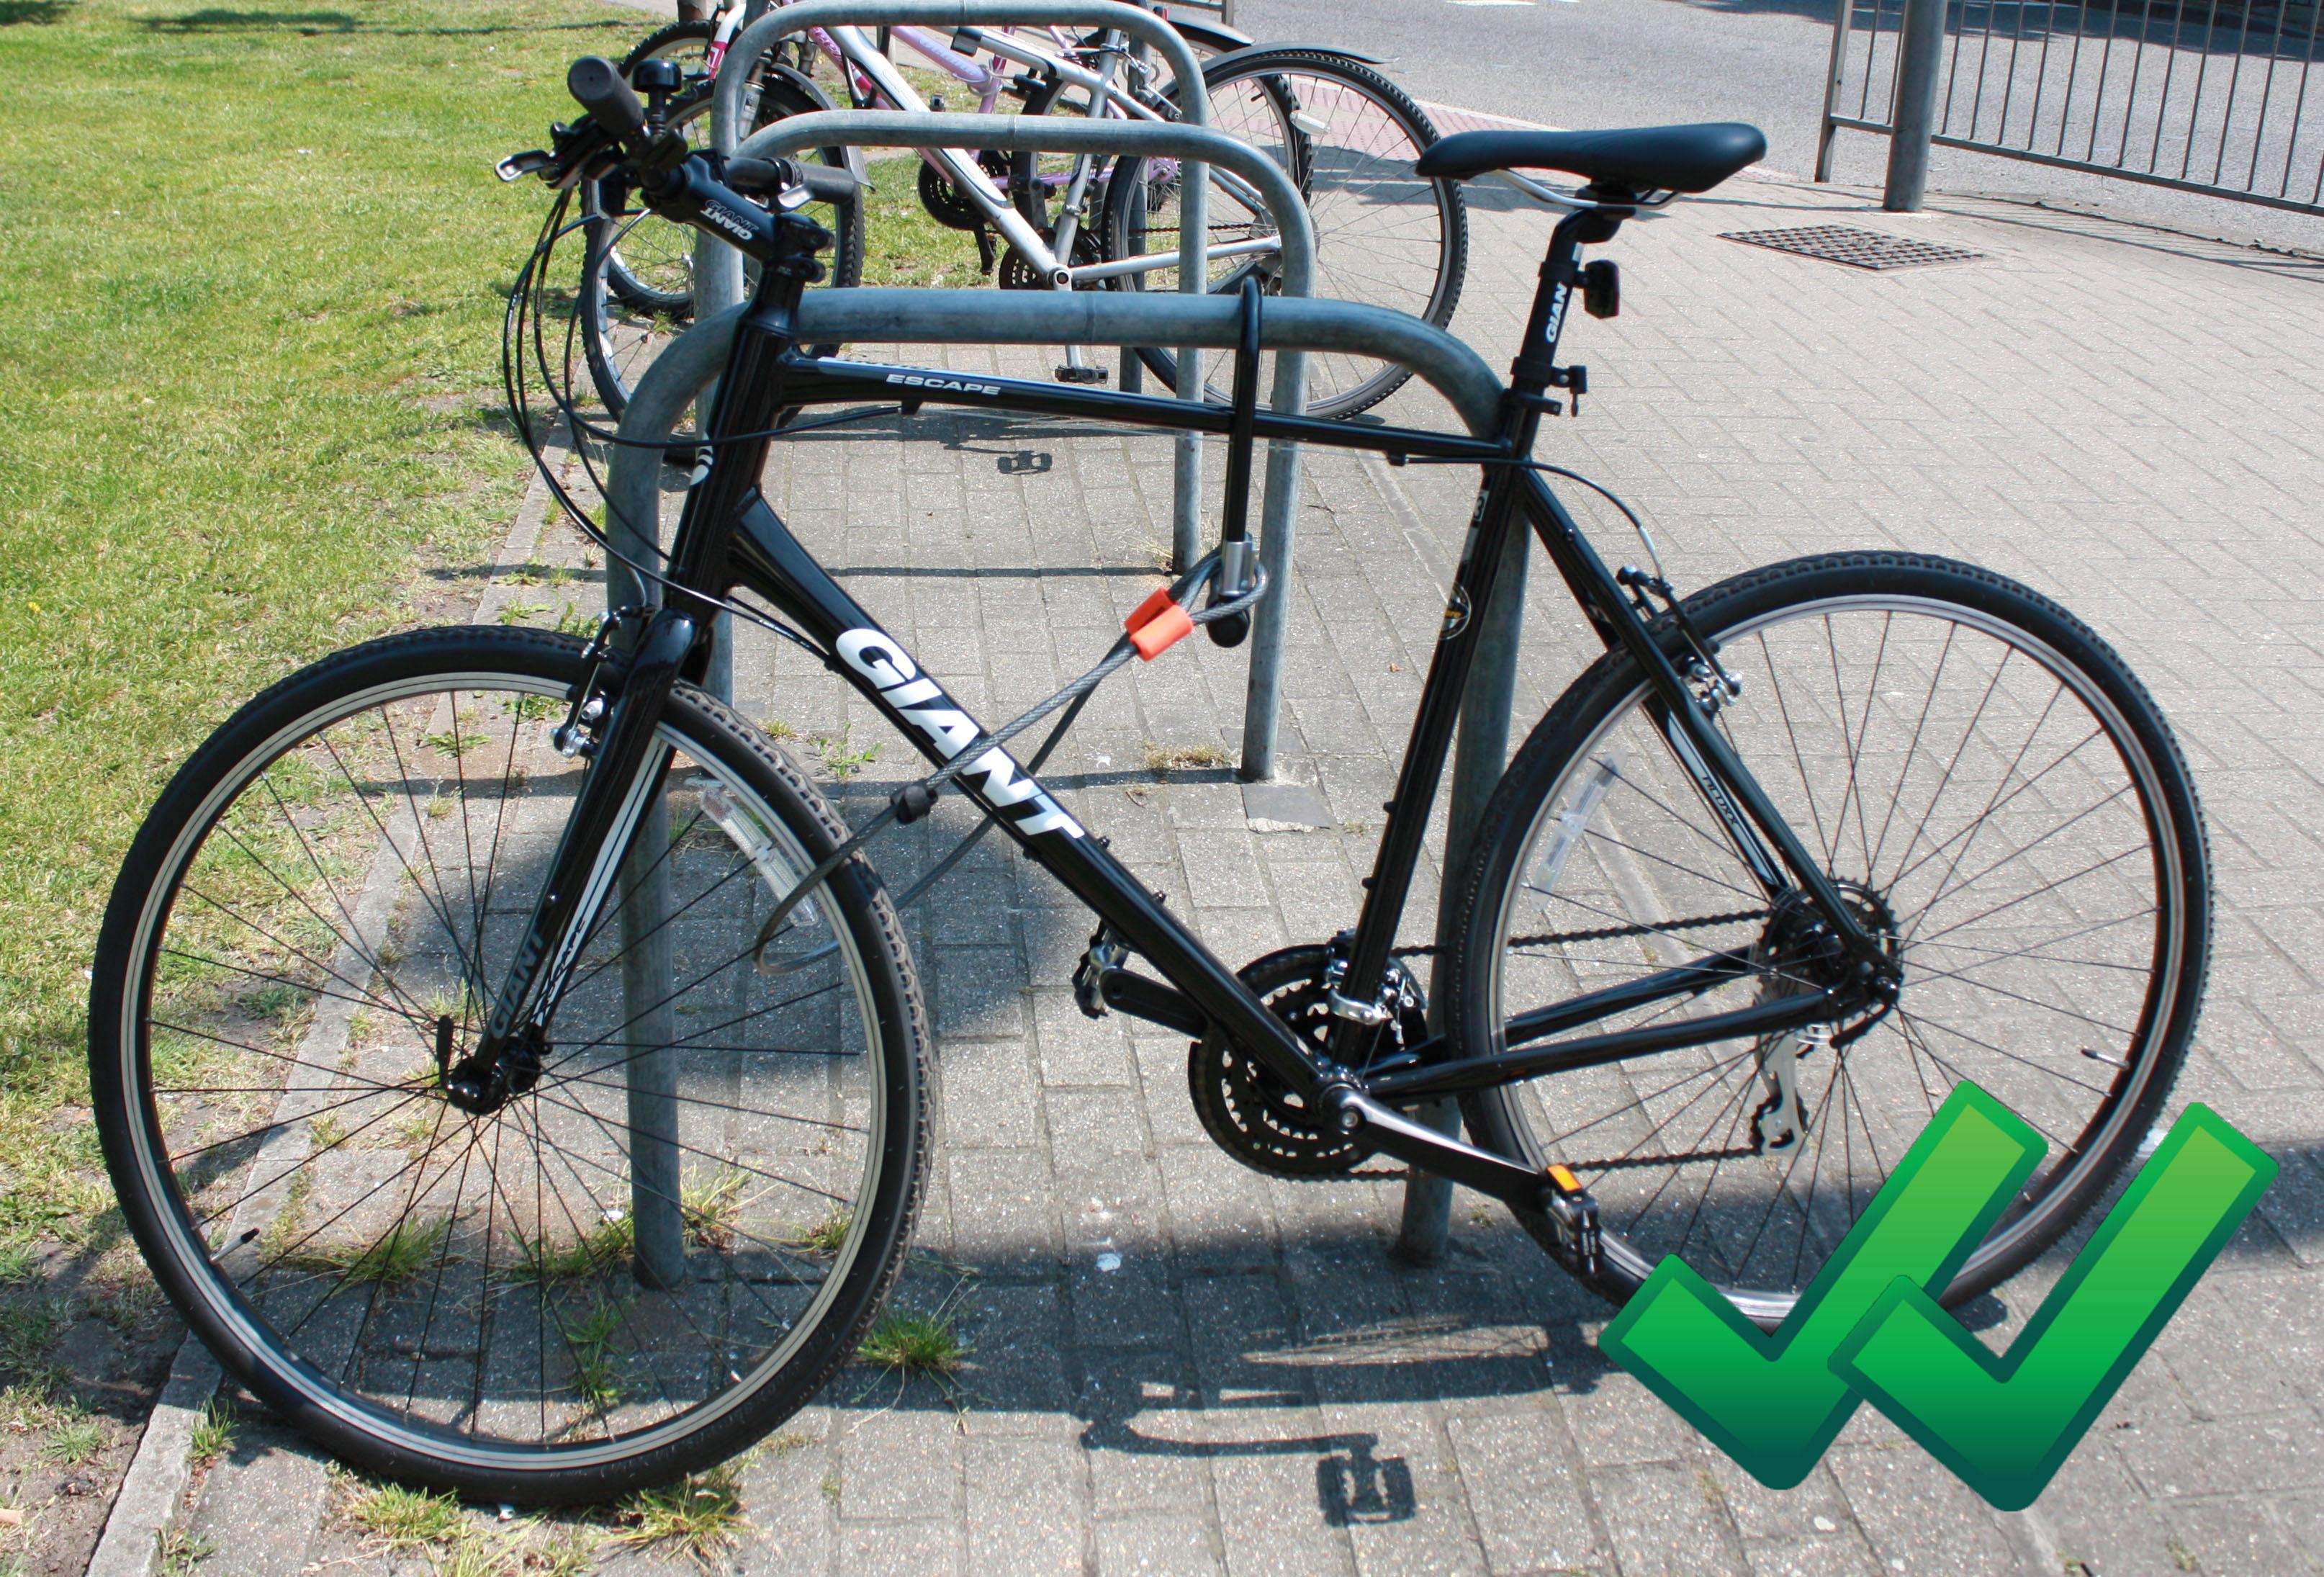 How To Lock Your Bike Eta Cycle Insurance